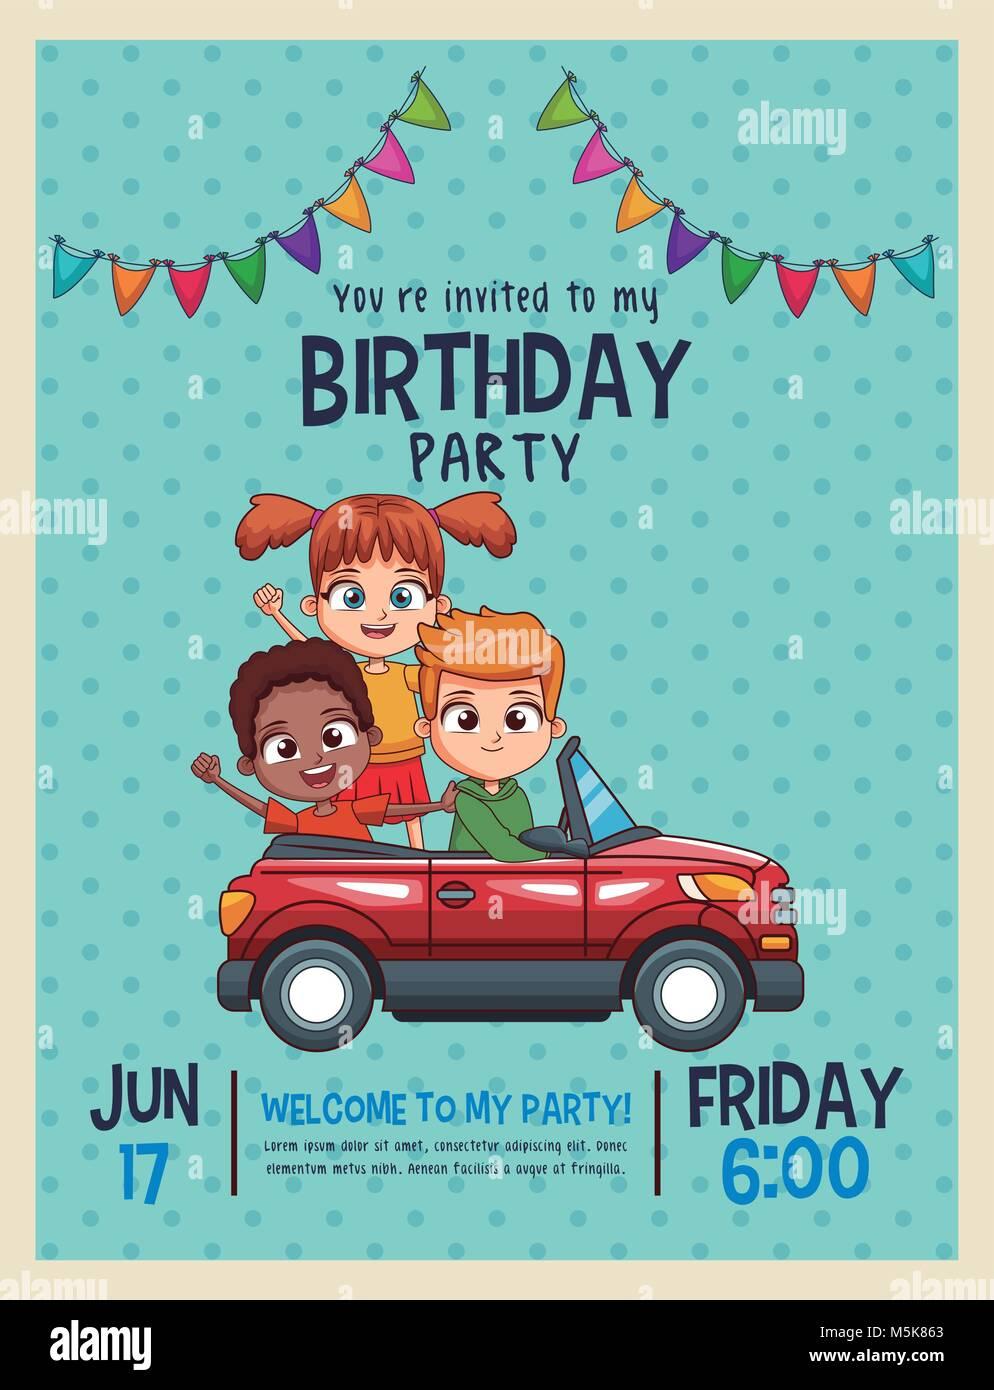 Kids Birthday Invitation Card Stock Vector Art Illustration